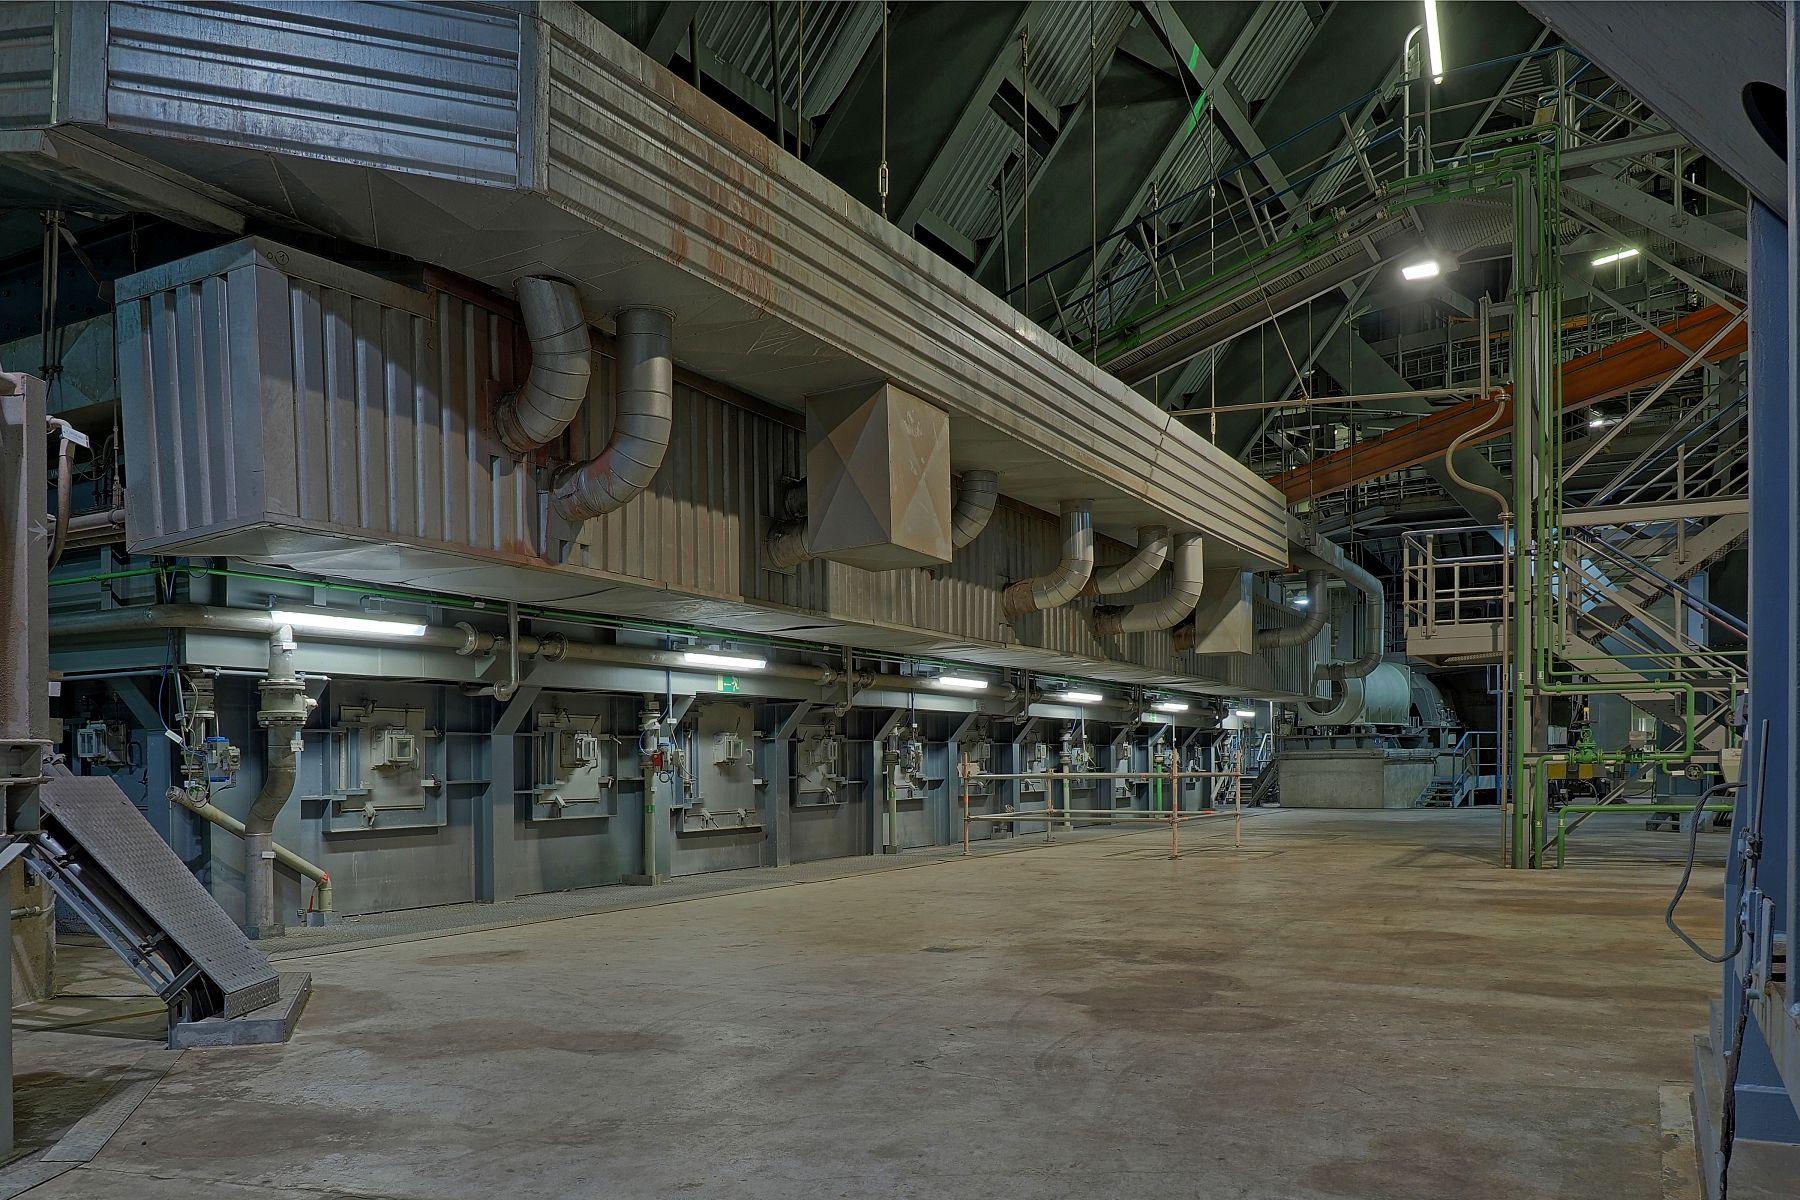 Fein Kessel Im Kraftwerk Galerie - Schaltplan Serie Circuit ...